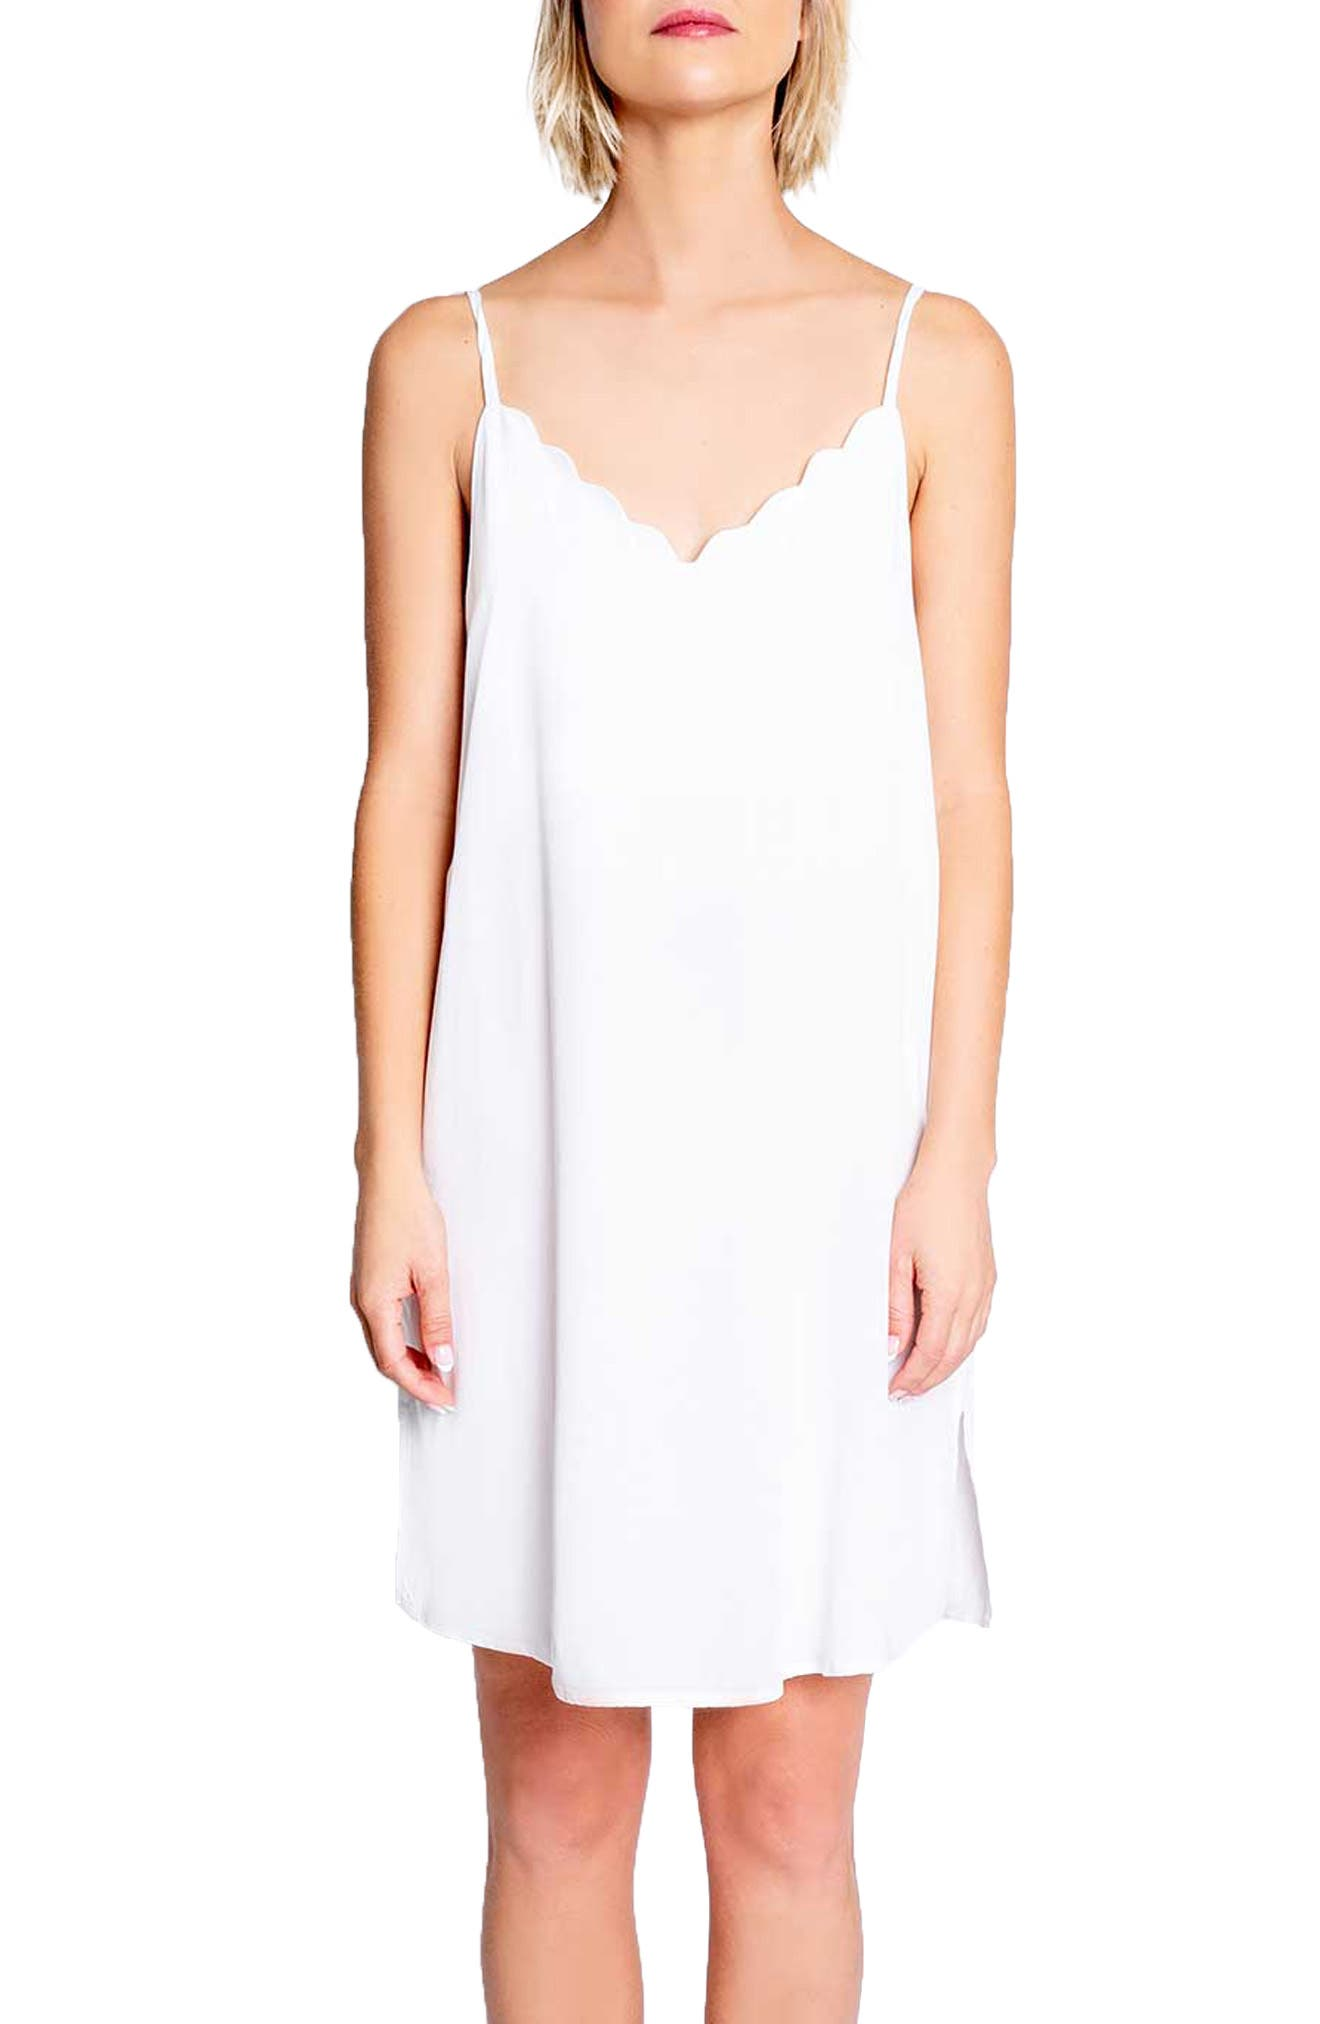 Image of PJ SALVAGE Scalloped V-Neck Sleep Dress